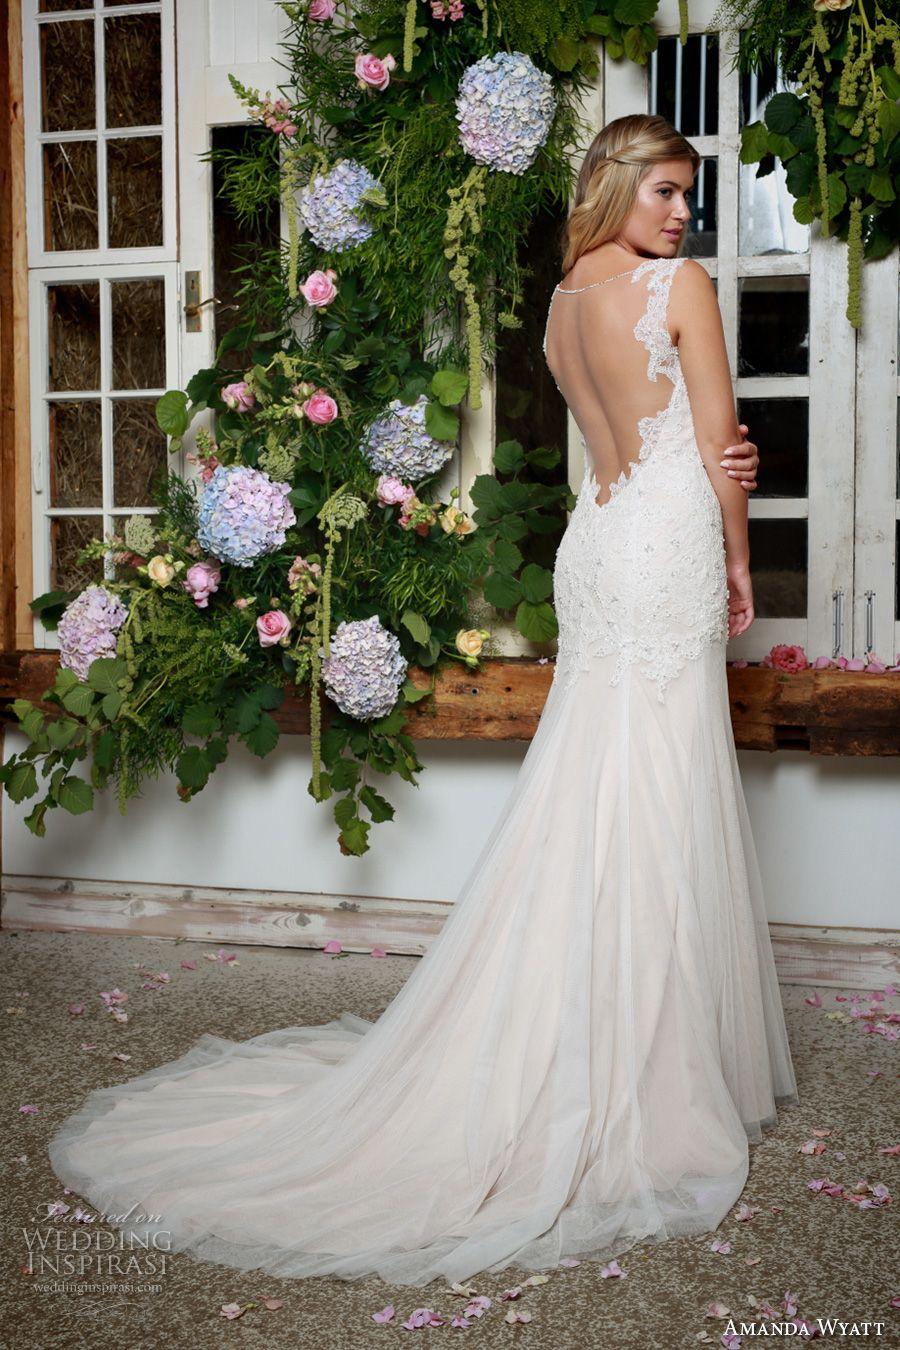 Amanda wyatt ucshe walks with beautyud bridal collection